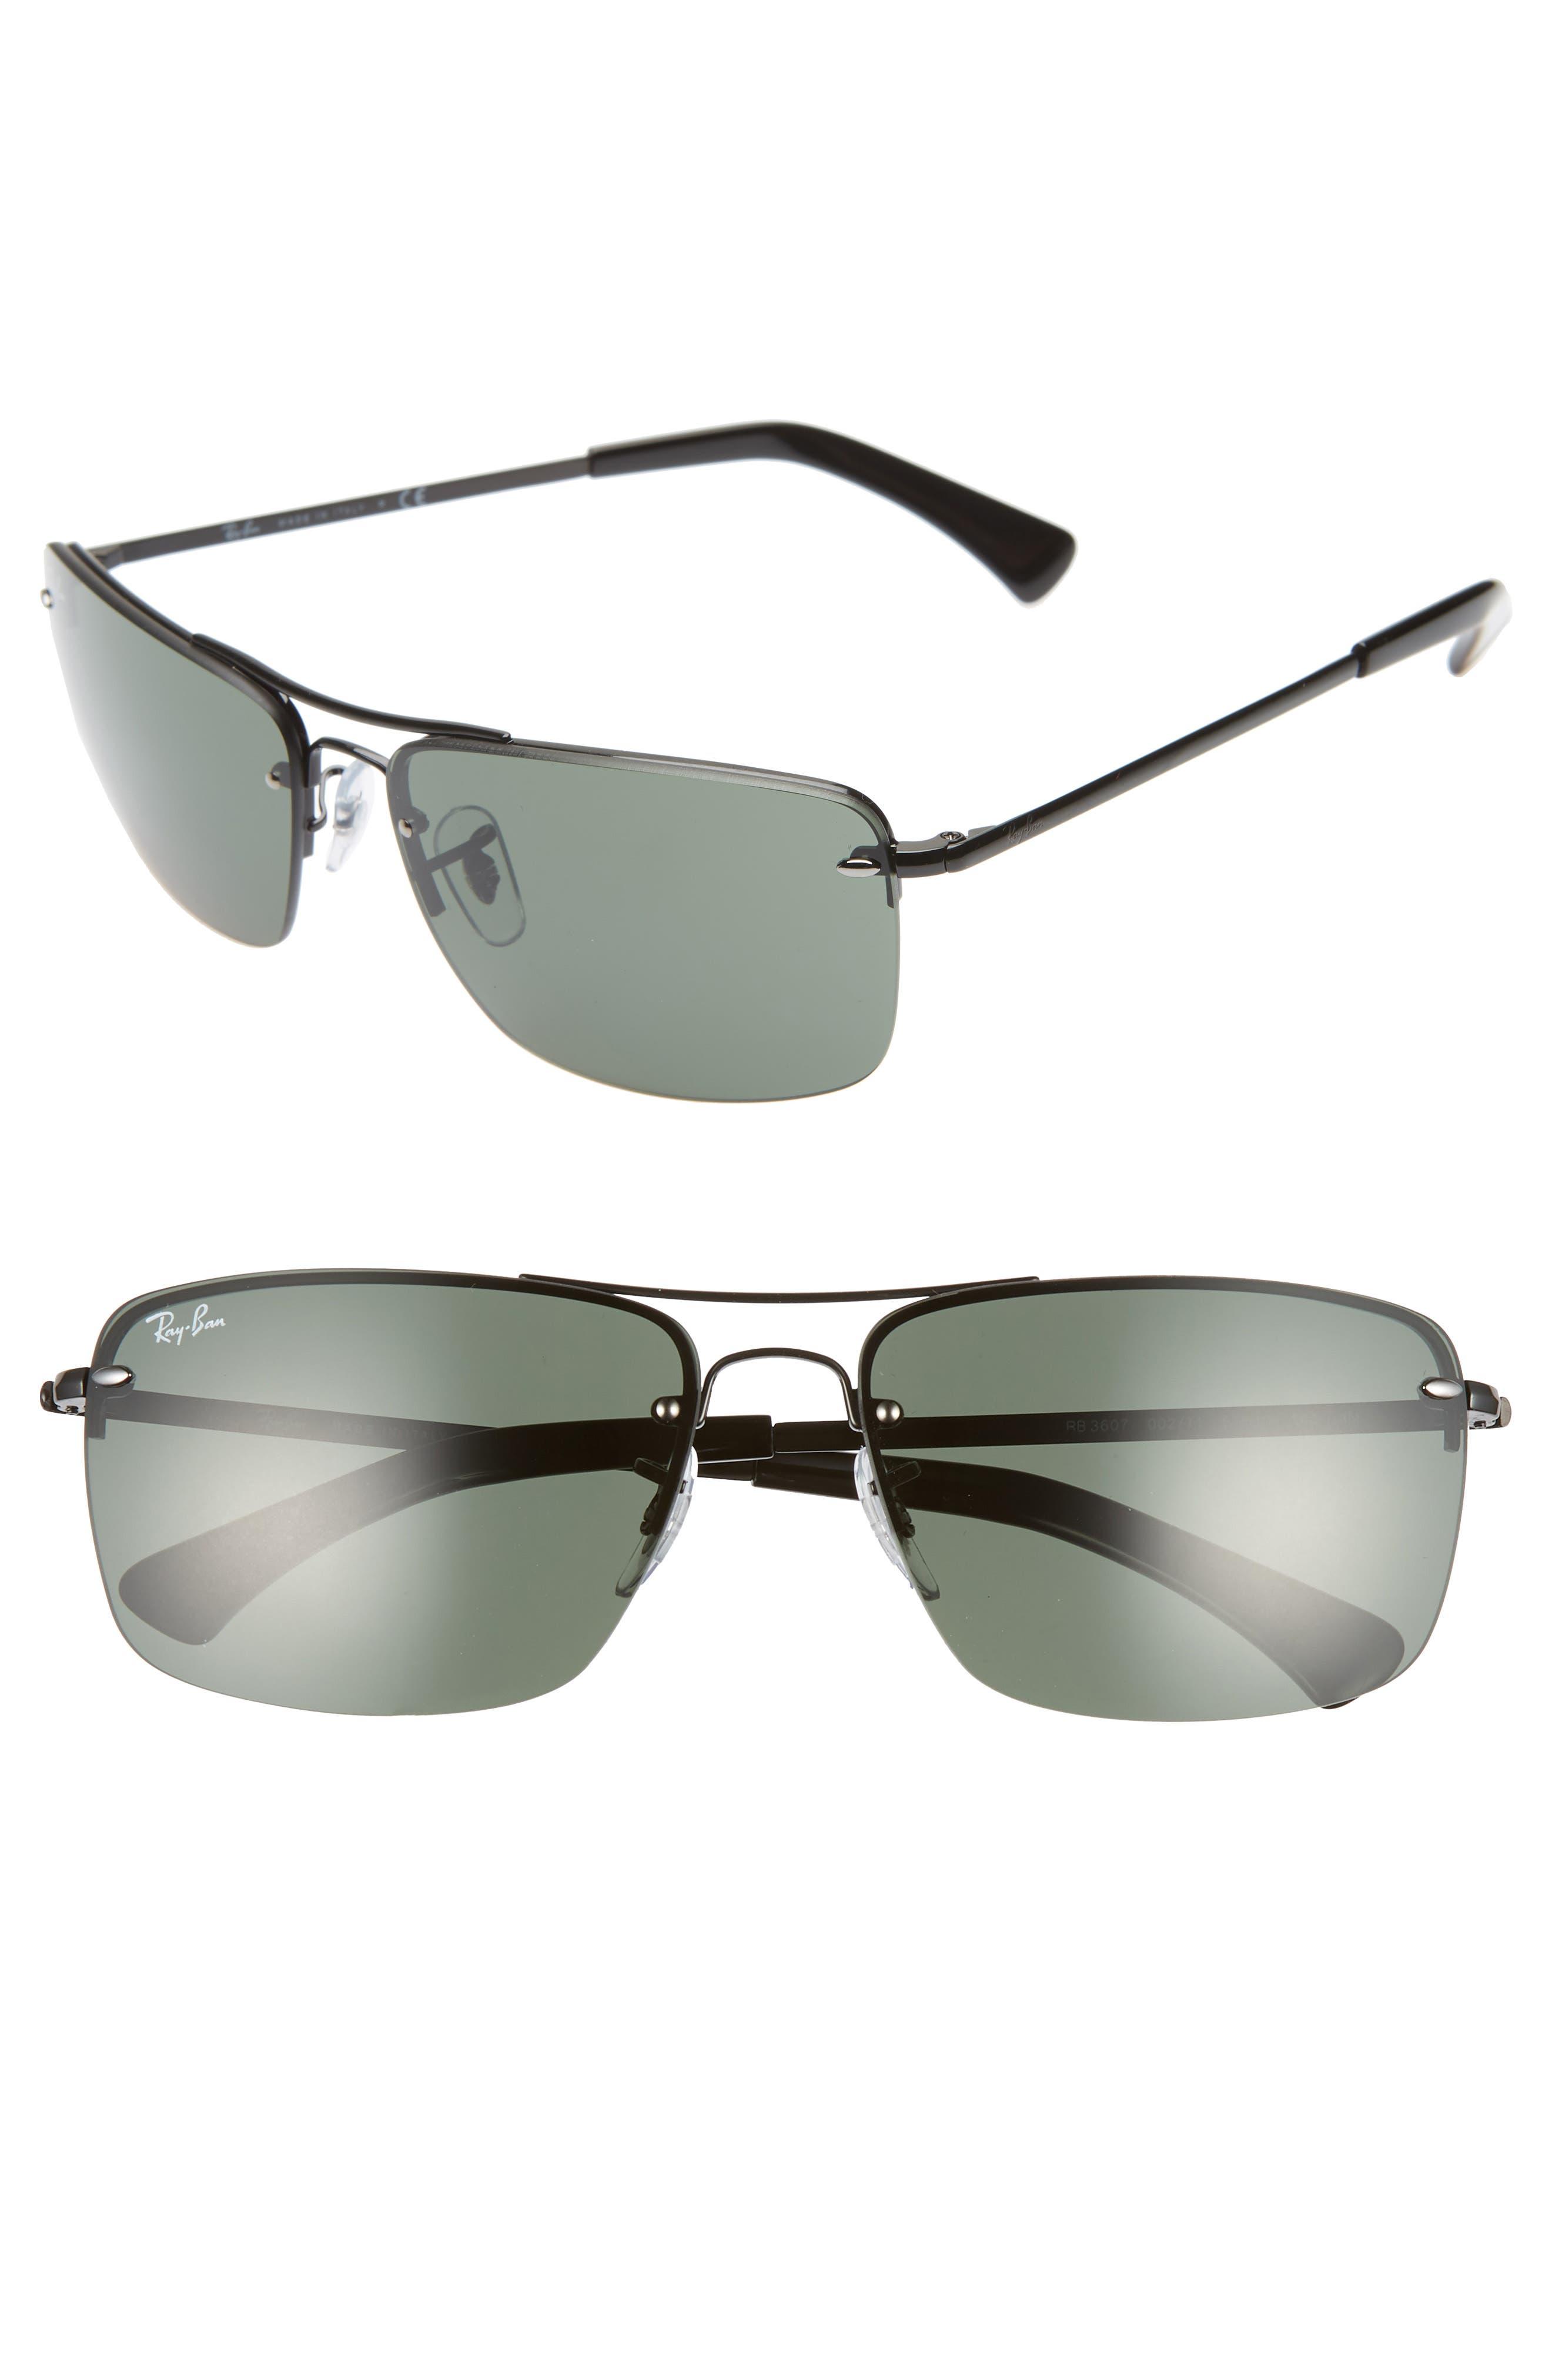 Ray-Ban 61Mm Semi Rimless Navigator Sunglasses - Black/ Dark Green Solid